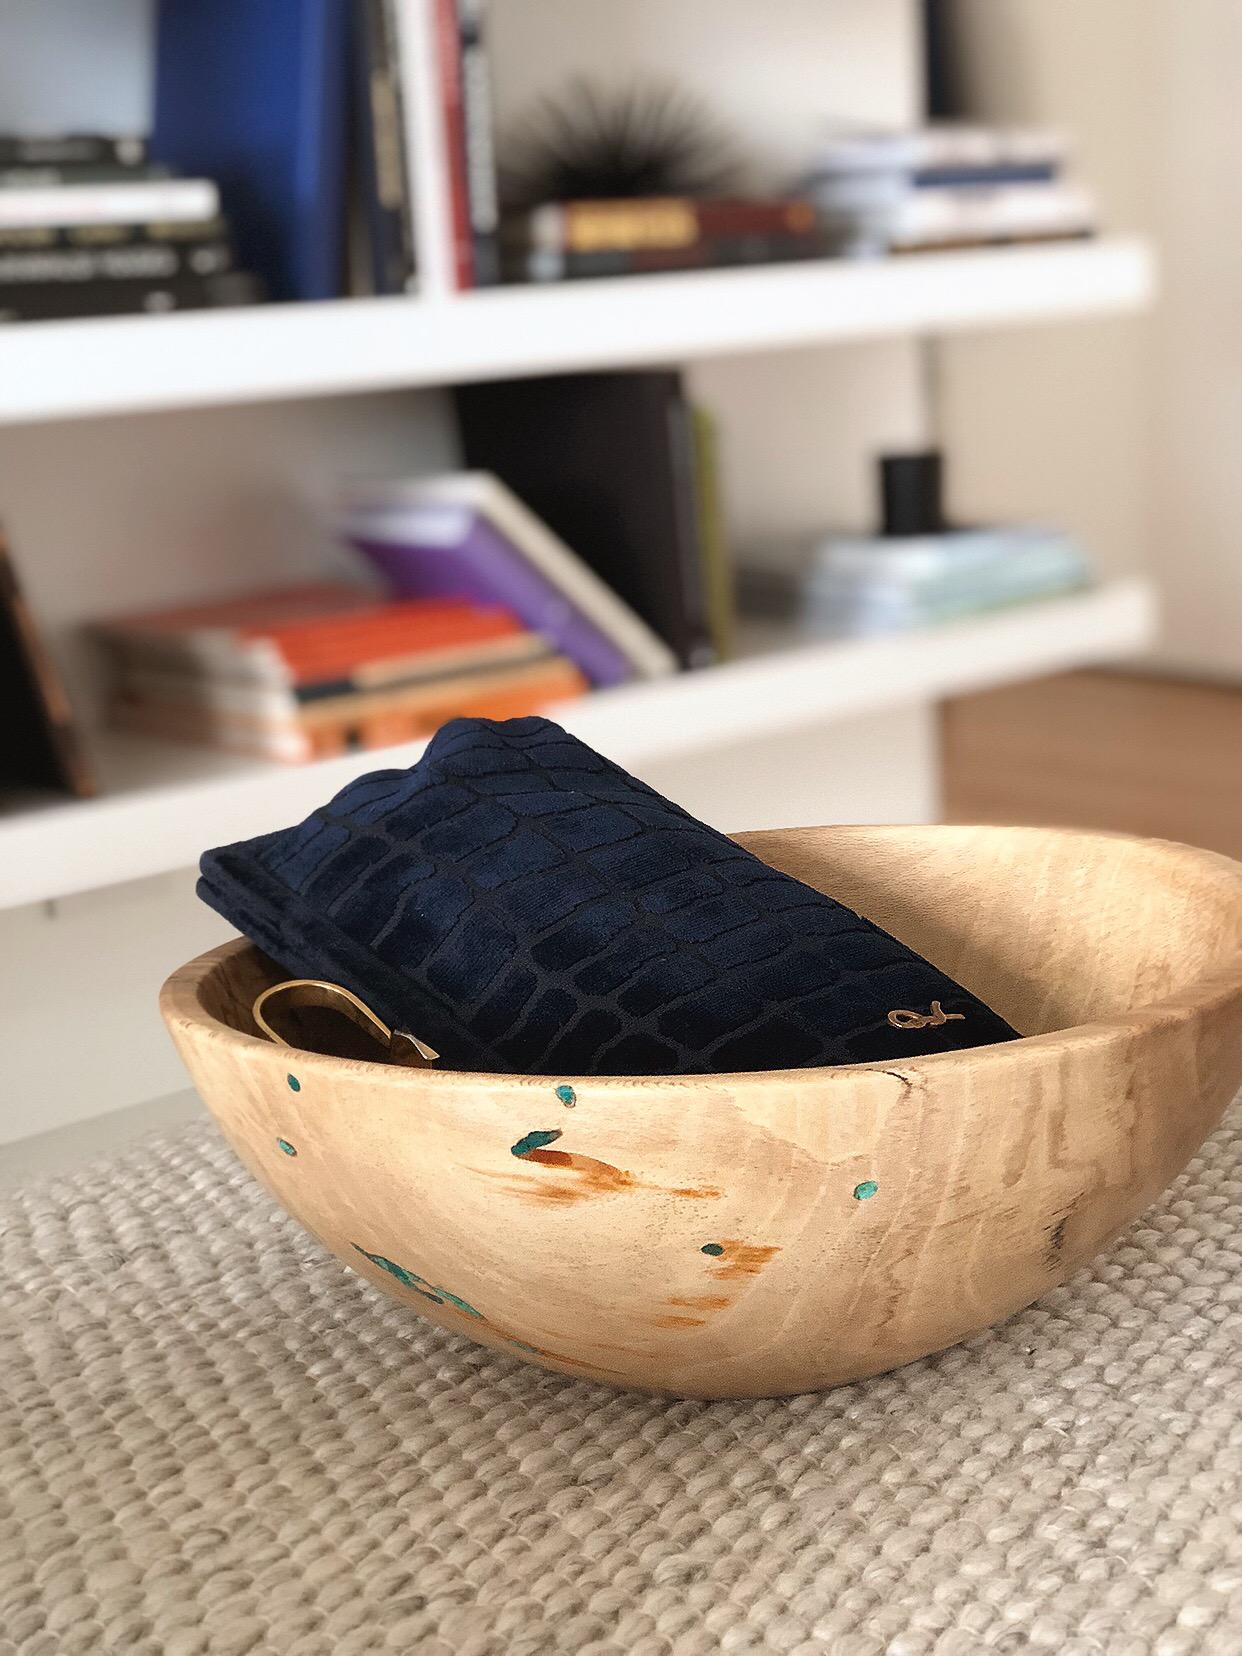 Wooden bowl pic 5.JPG